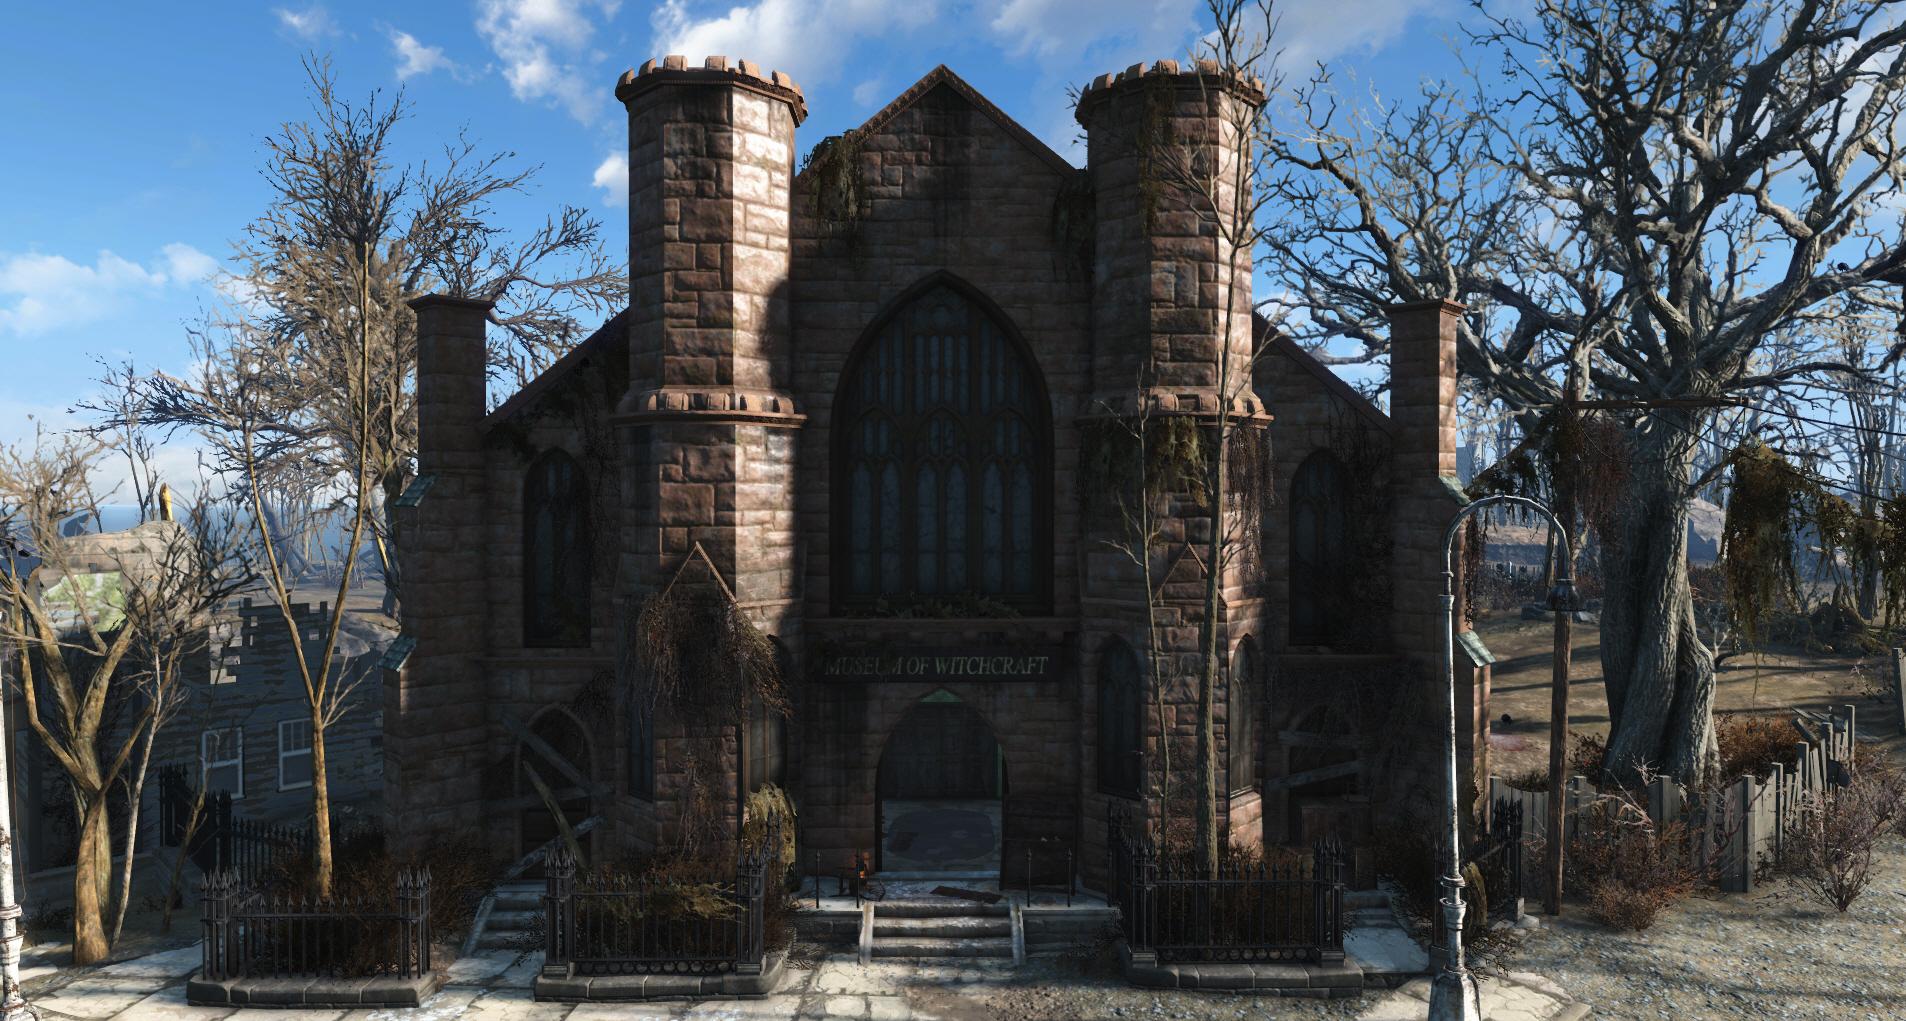 MuseumofWitchcraft-Fallout4.jpg